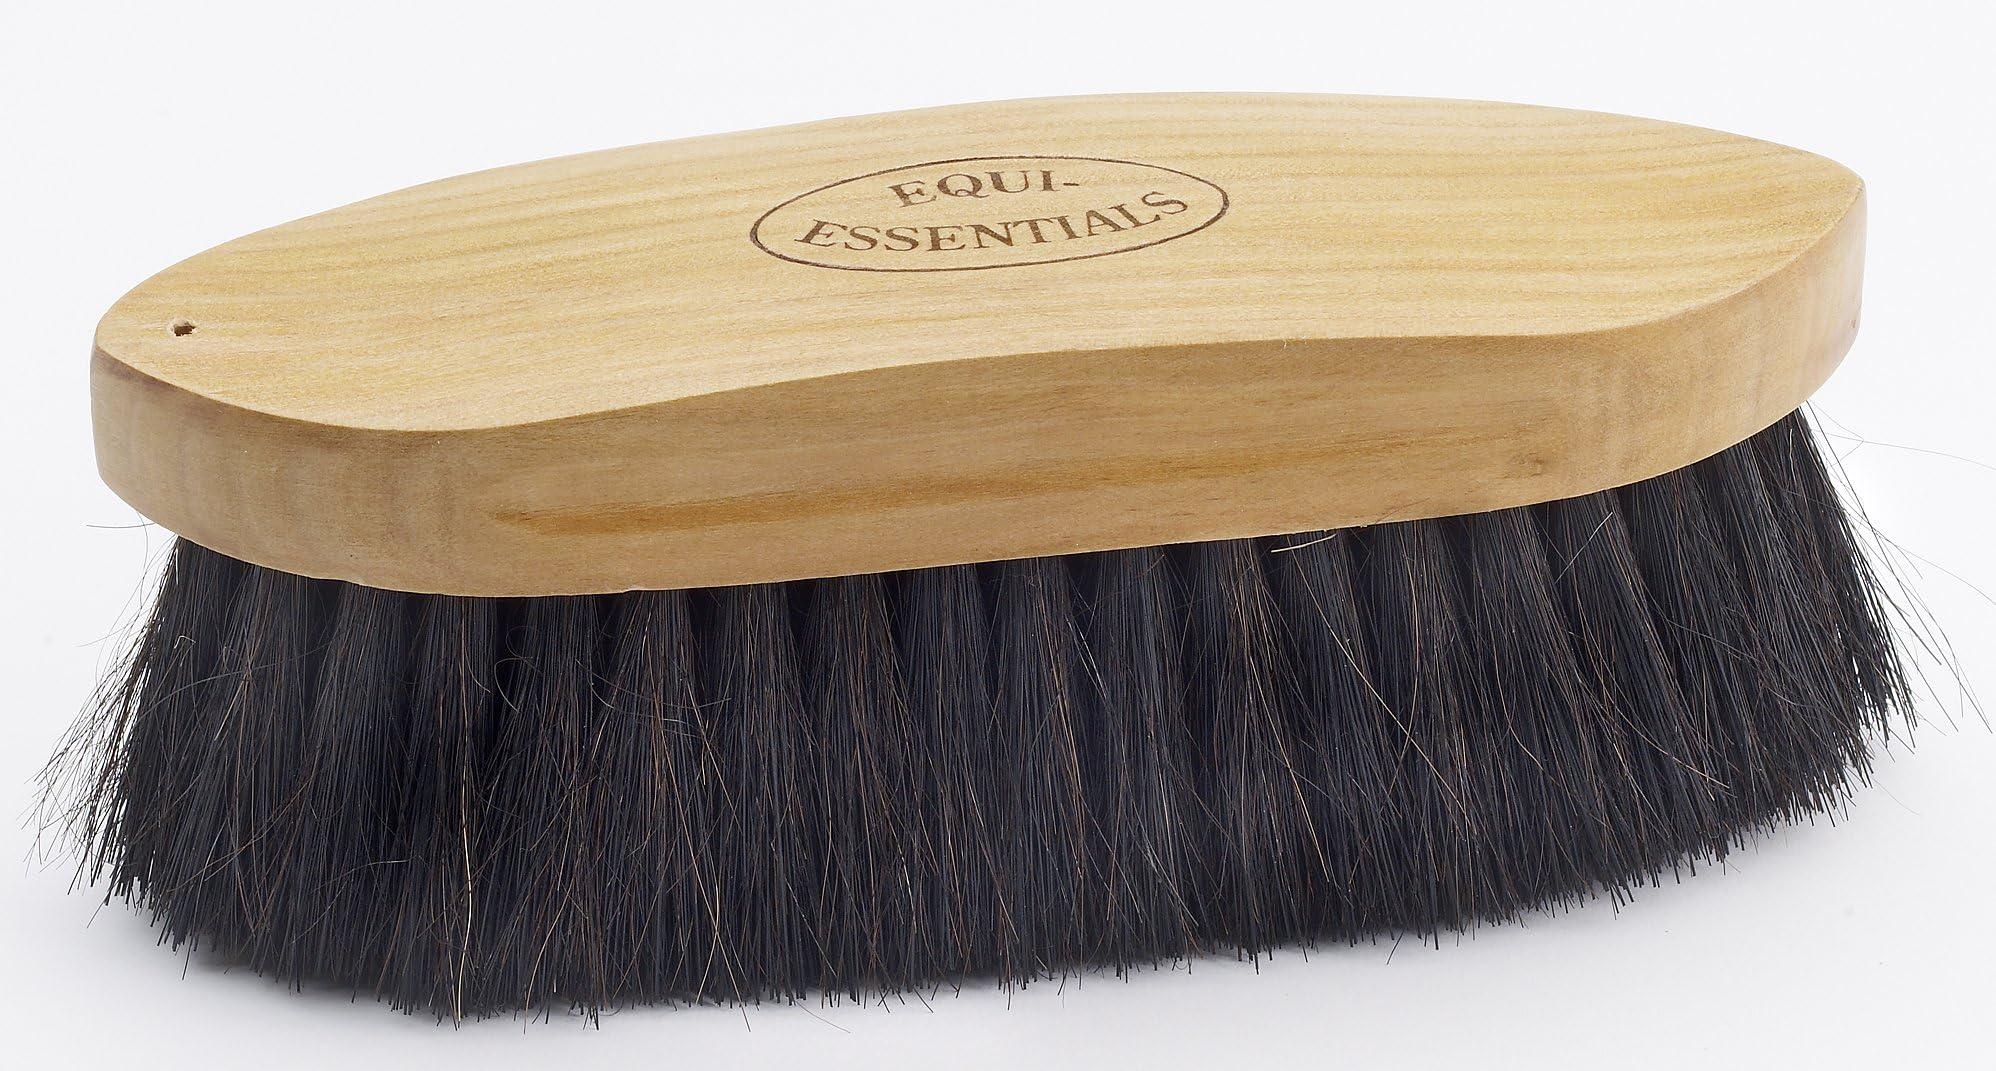 Shires Long Bristle Ezi Groom Dandy Brush One Size Blue